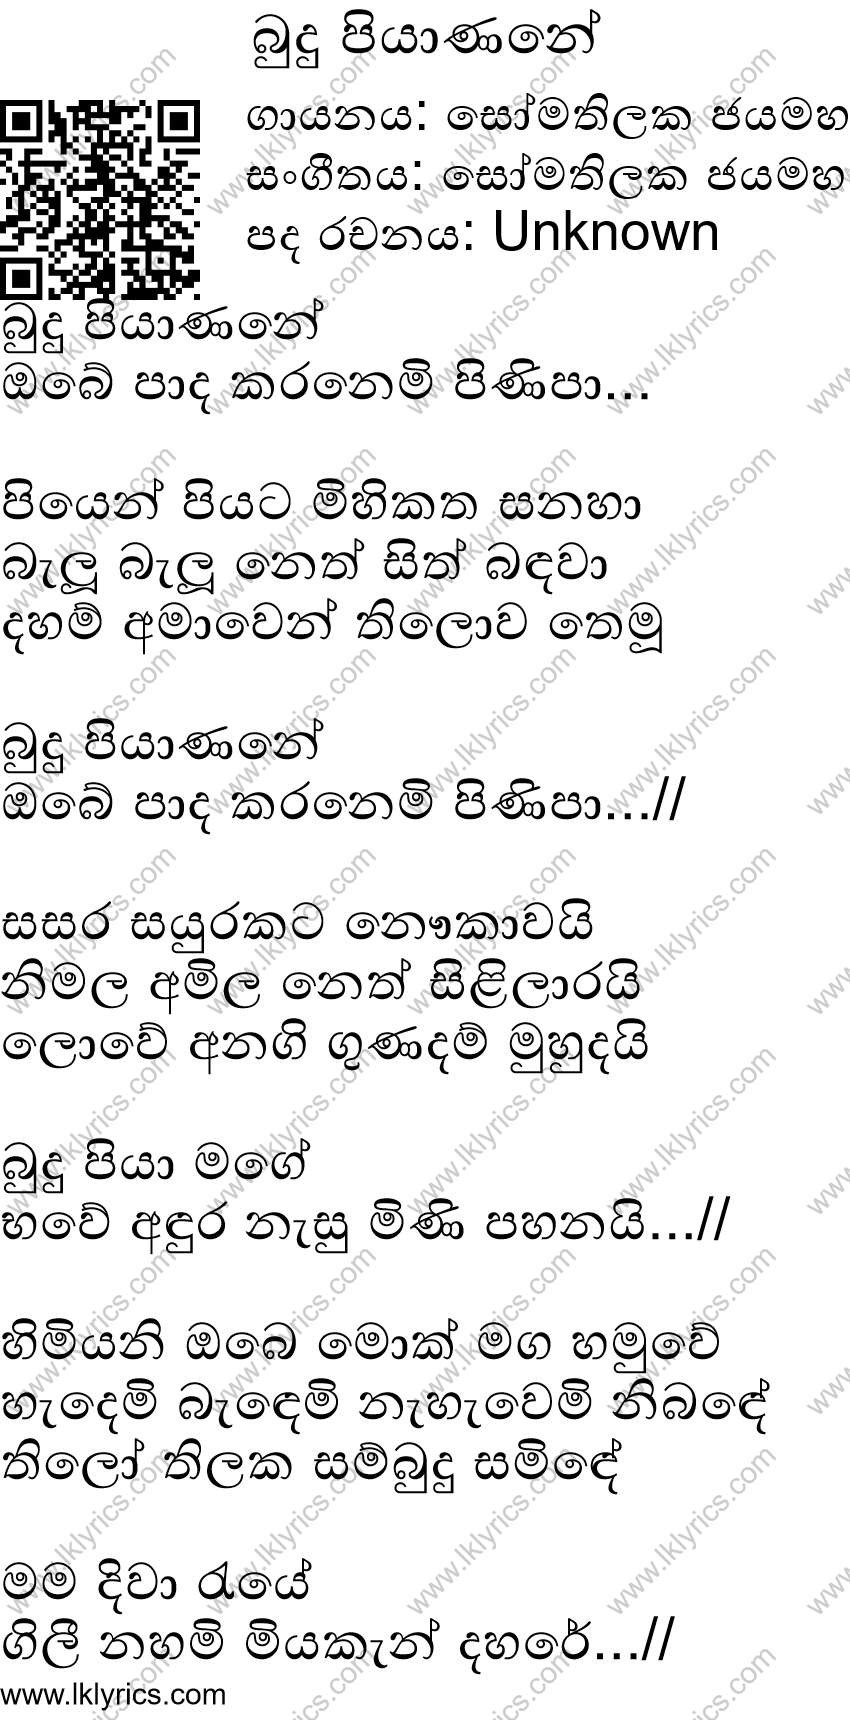 Budu Piyanane Lyrics Lk Lyrics